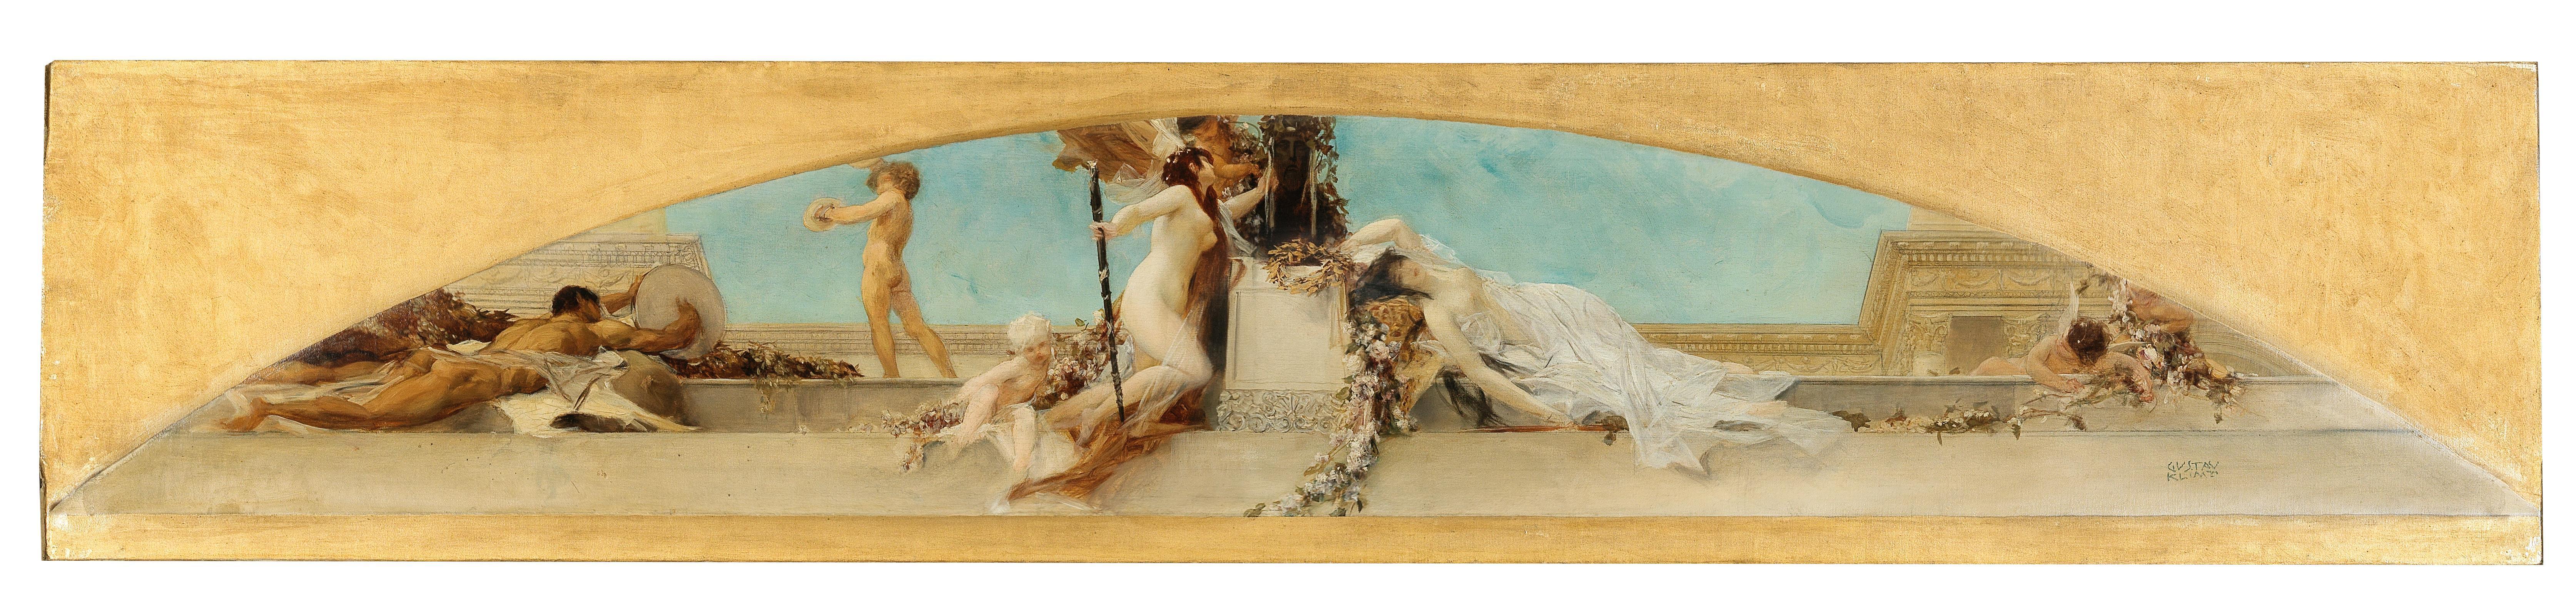 Leopold Museum erhielt Klimt-Bild geschenkt